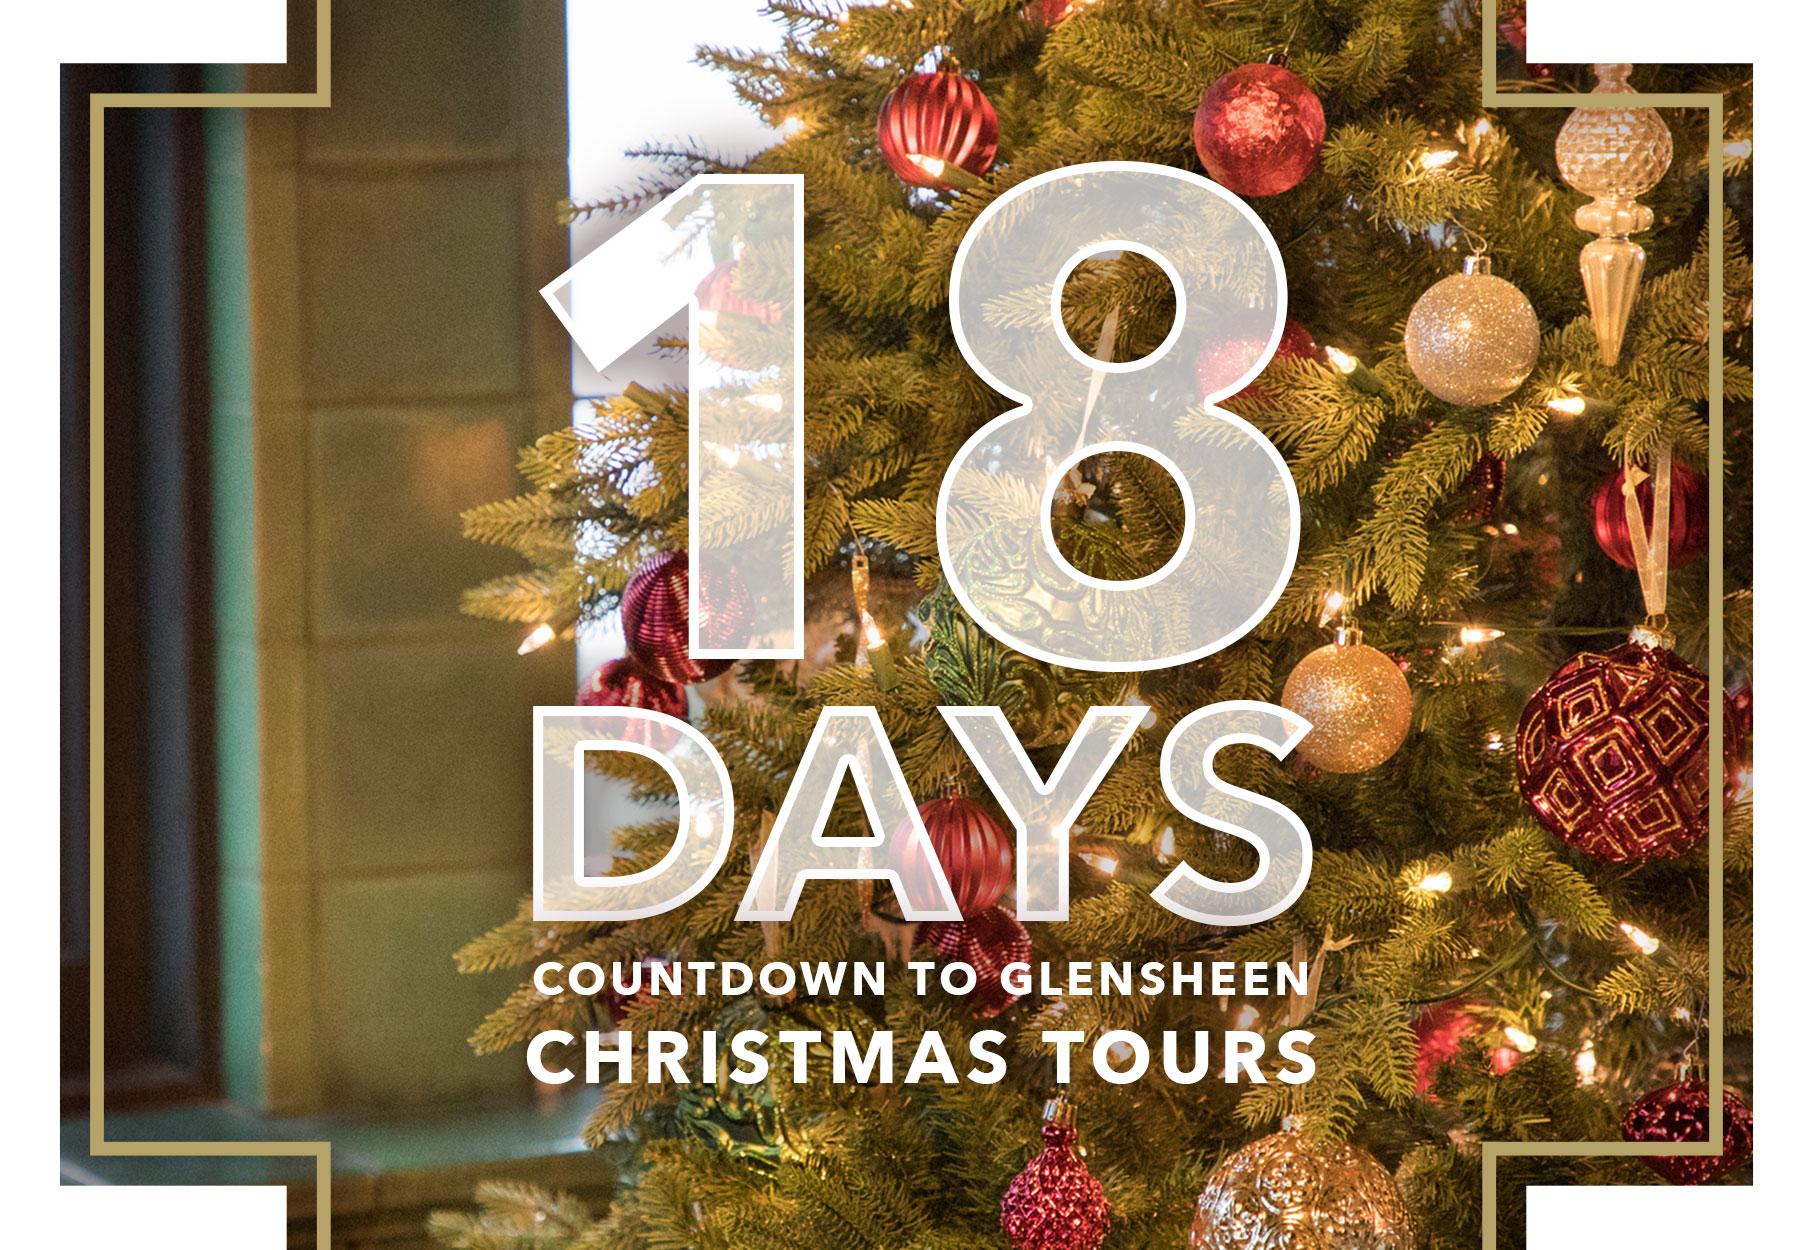 Christmas Tours.18 Days Until Christmas Tours Glensheen